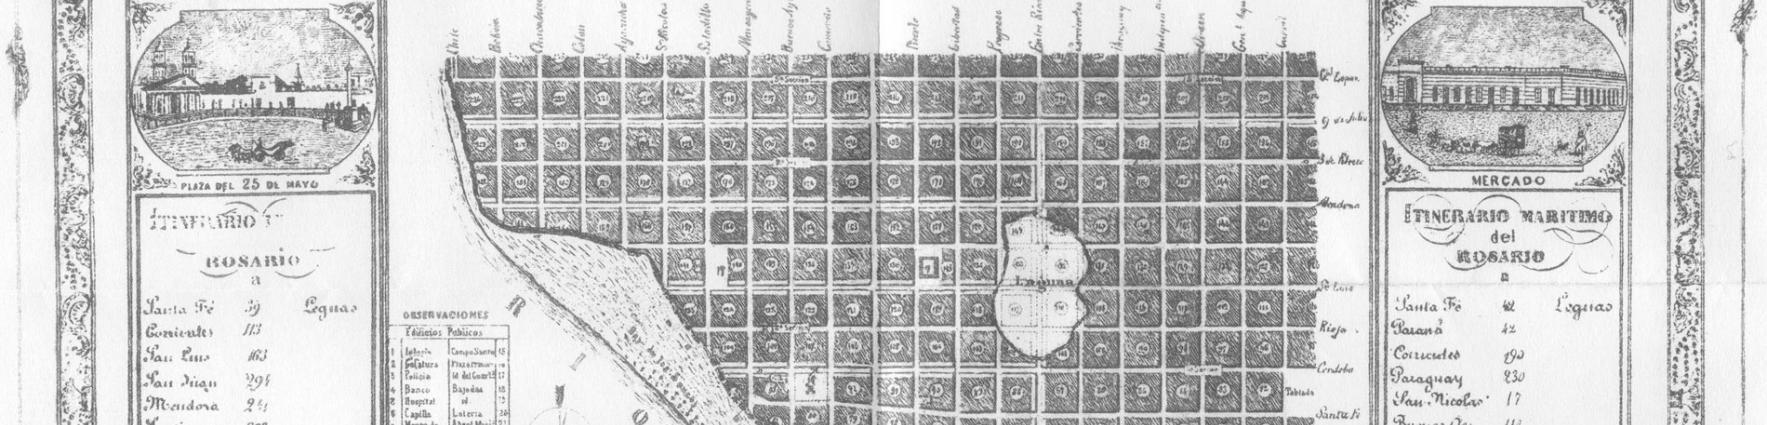 Rosario mapa antiguo